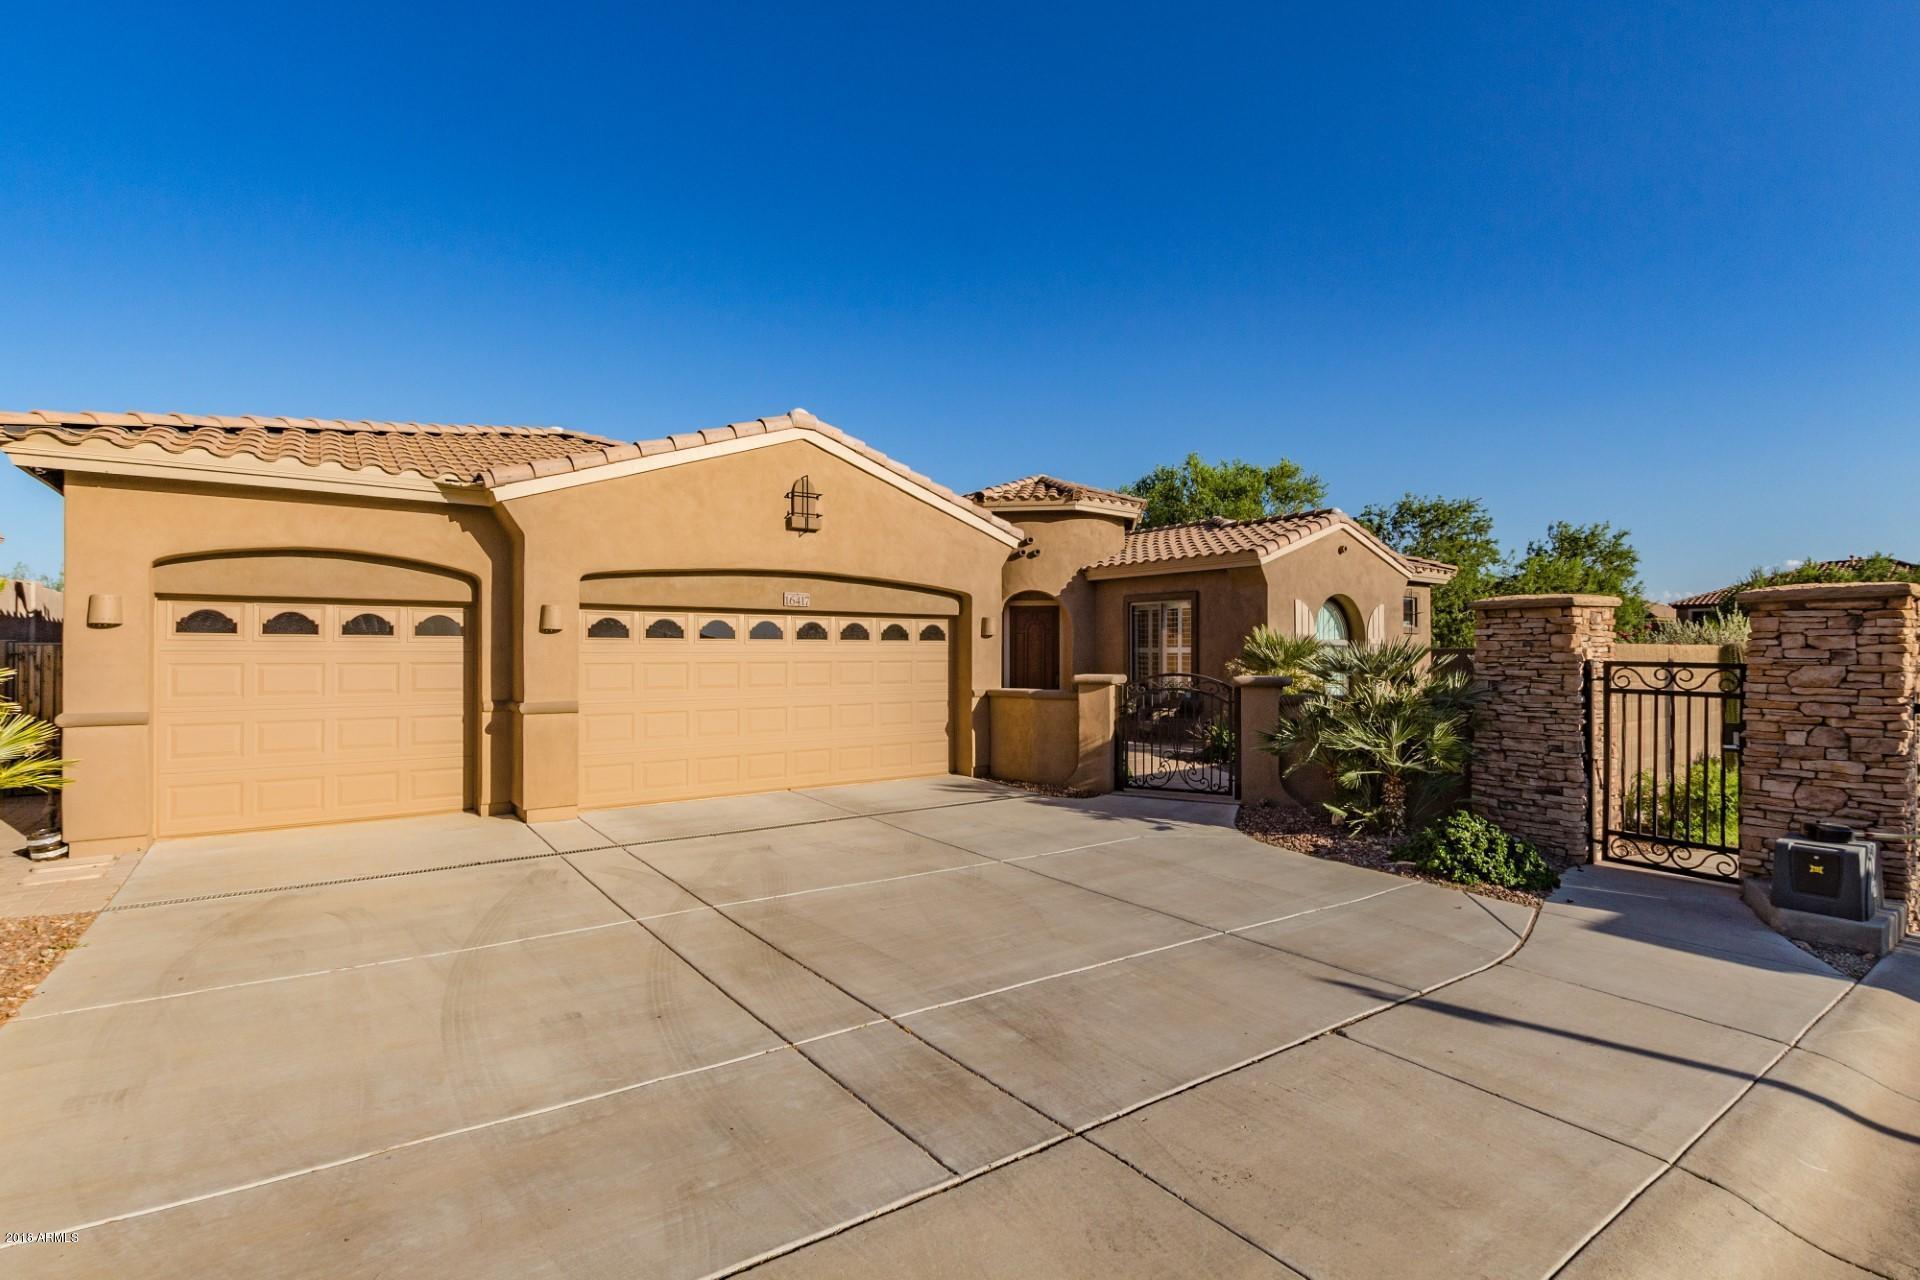 16417 28th Avenue, Phoenix, Arizona 85045, 4 Bedrooms Bedrooms, ,3 BathroomsBathrooms,Residential,For Sale,28th,6152367